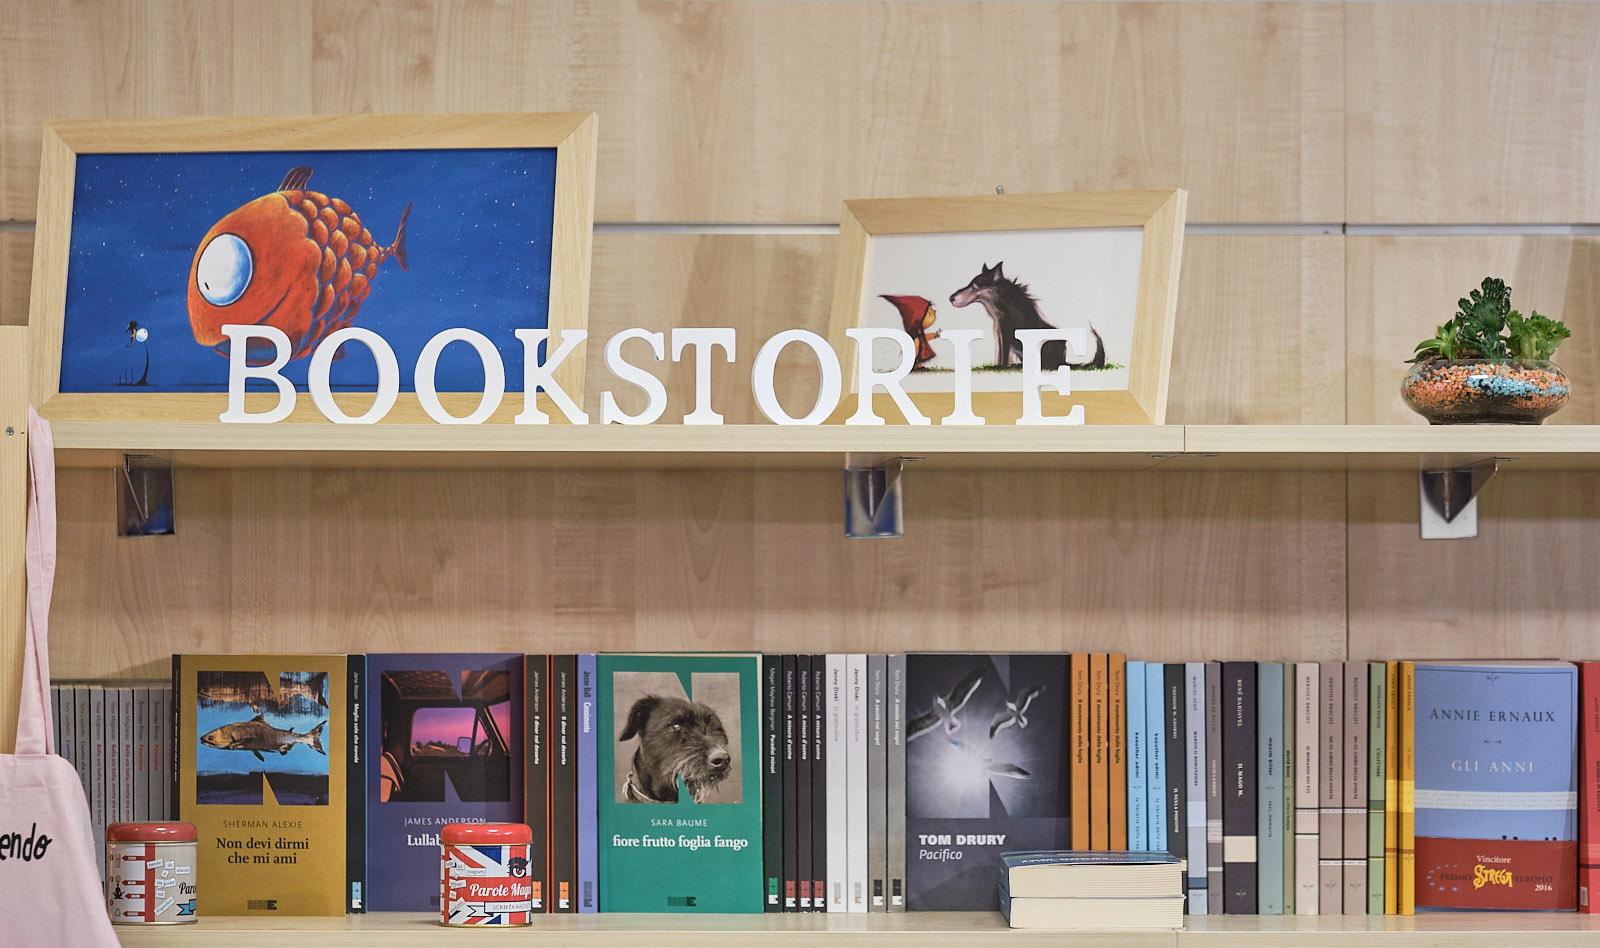 Bookstorie Roma